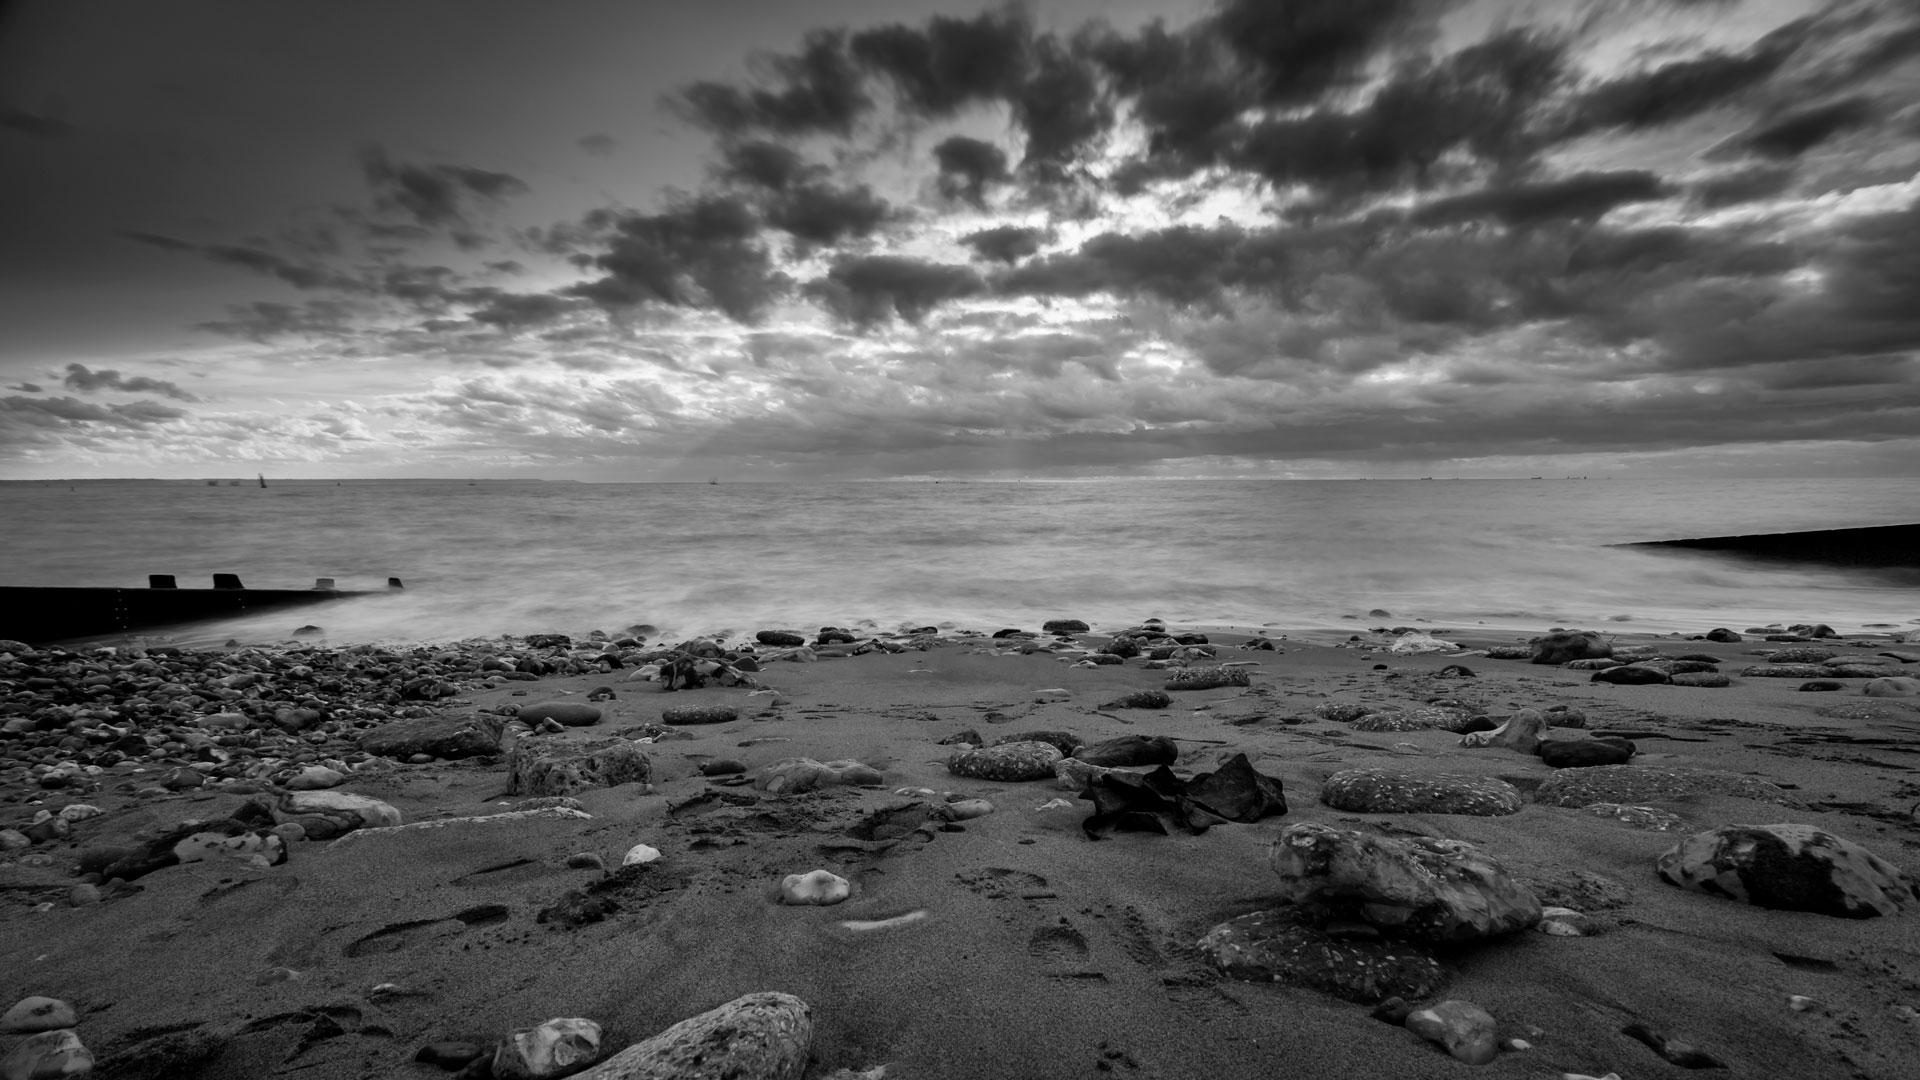 La plage du Havre